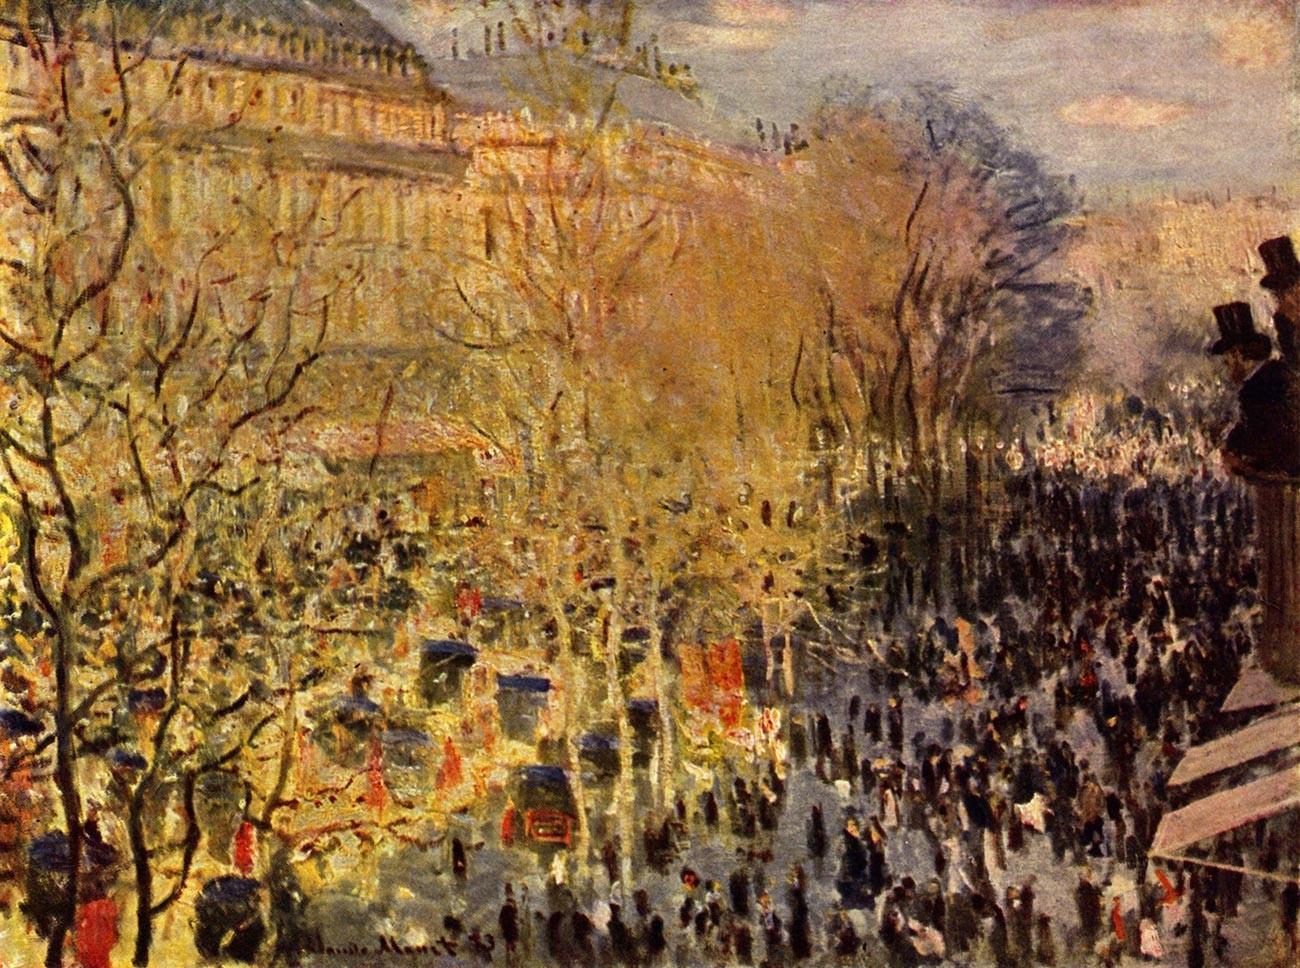 Claude Monet. Boulevard des Capucines, 1873